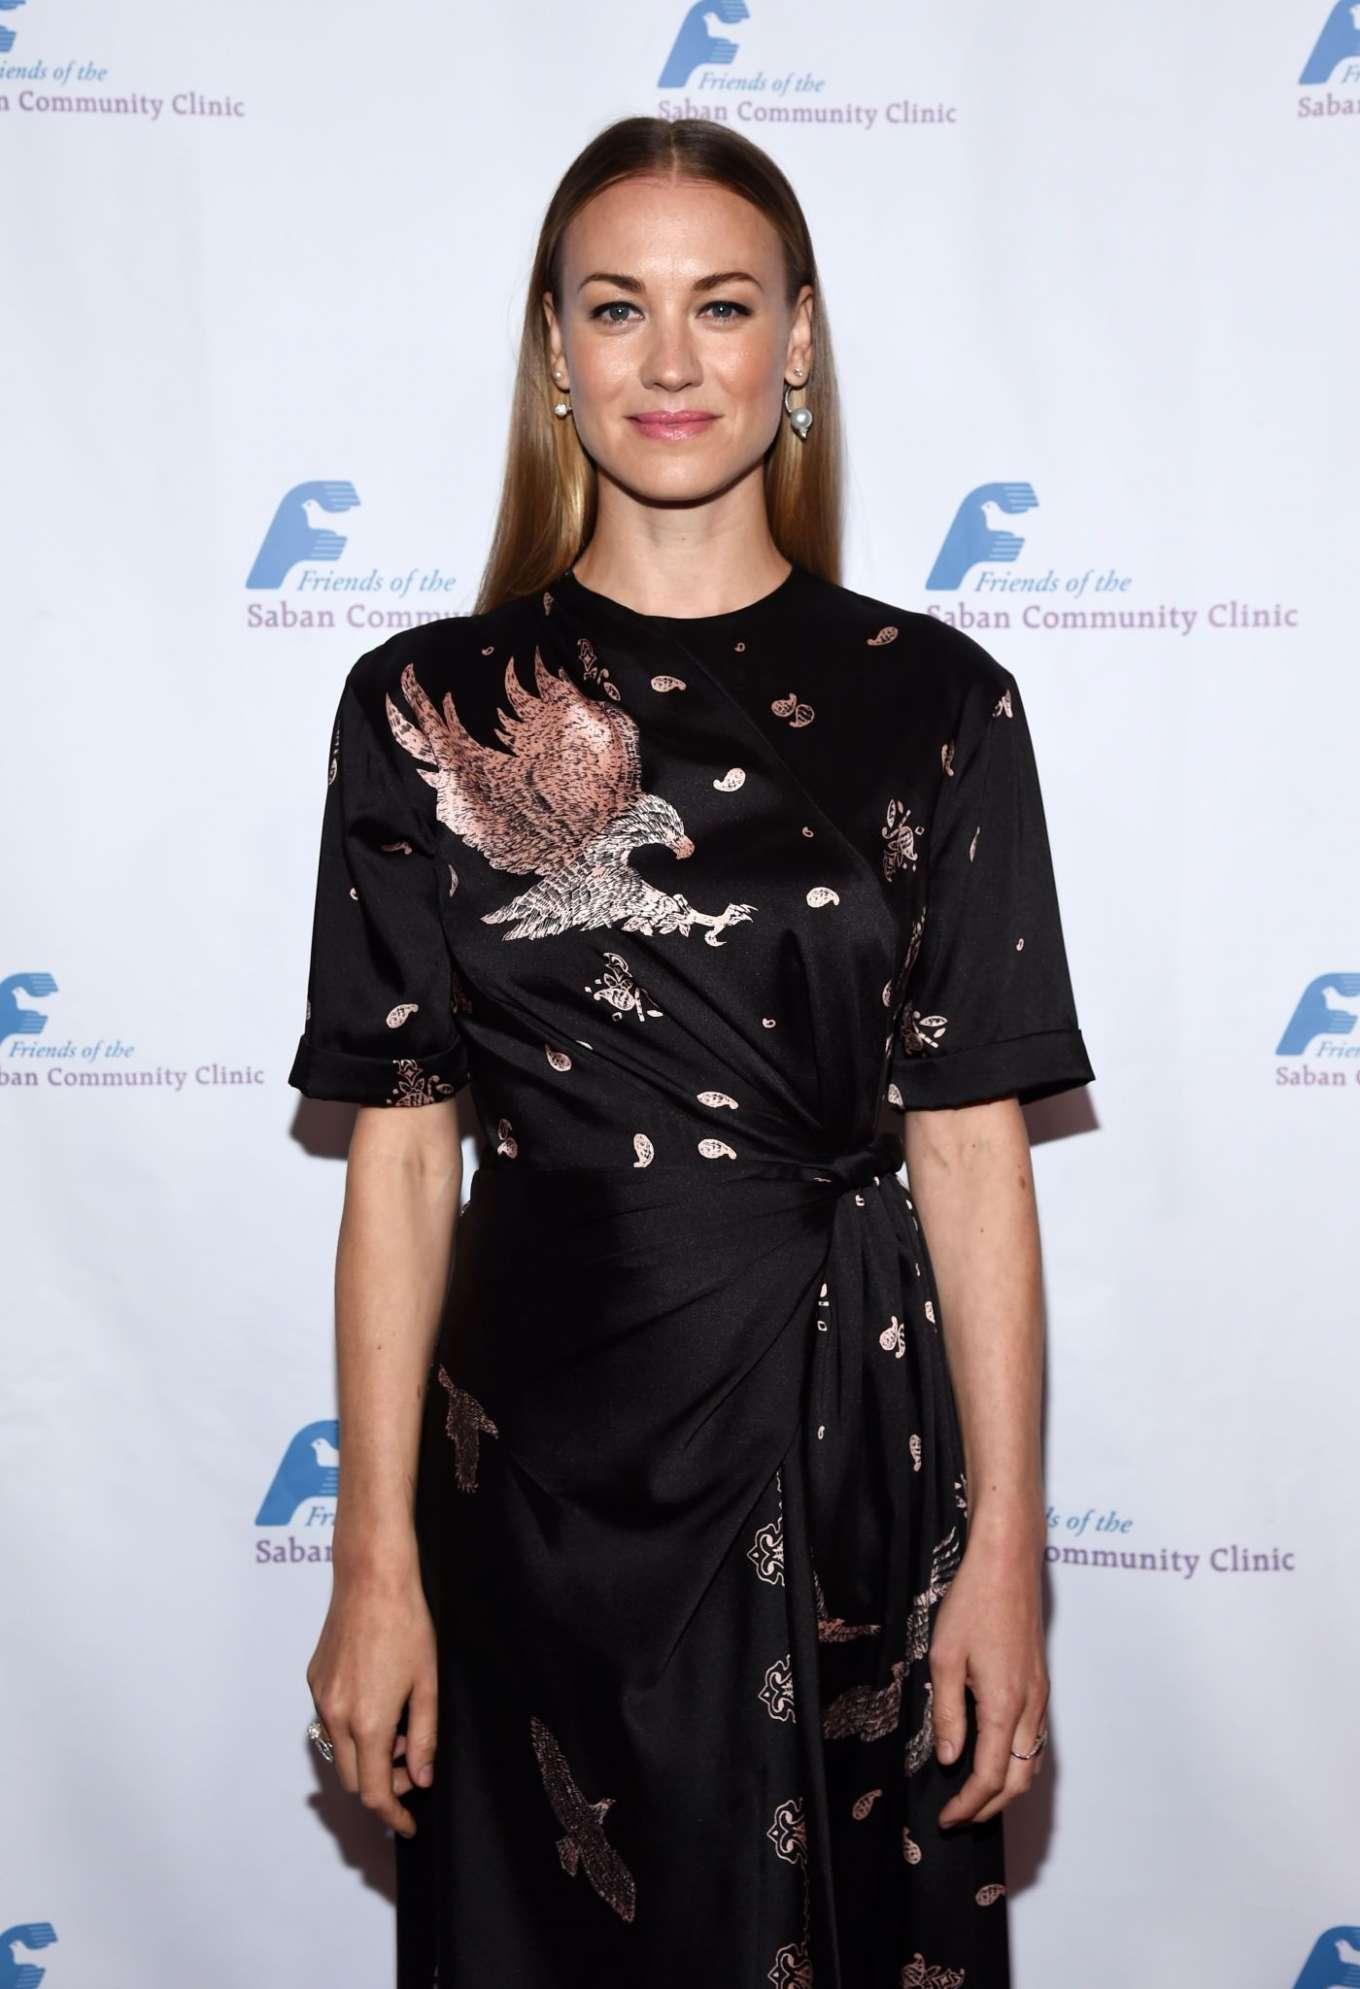 Yvonne Strahovski - Saban Cummunity Clinic's 43rd Annual Dinner Gala in Beverly Hills